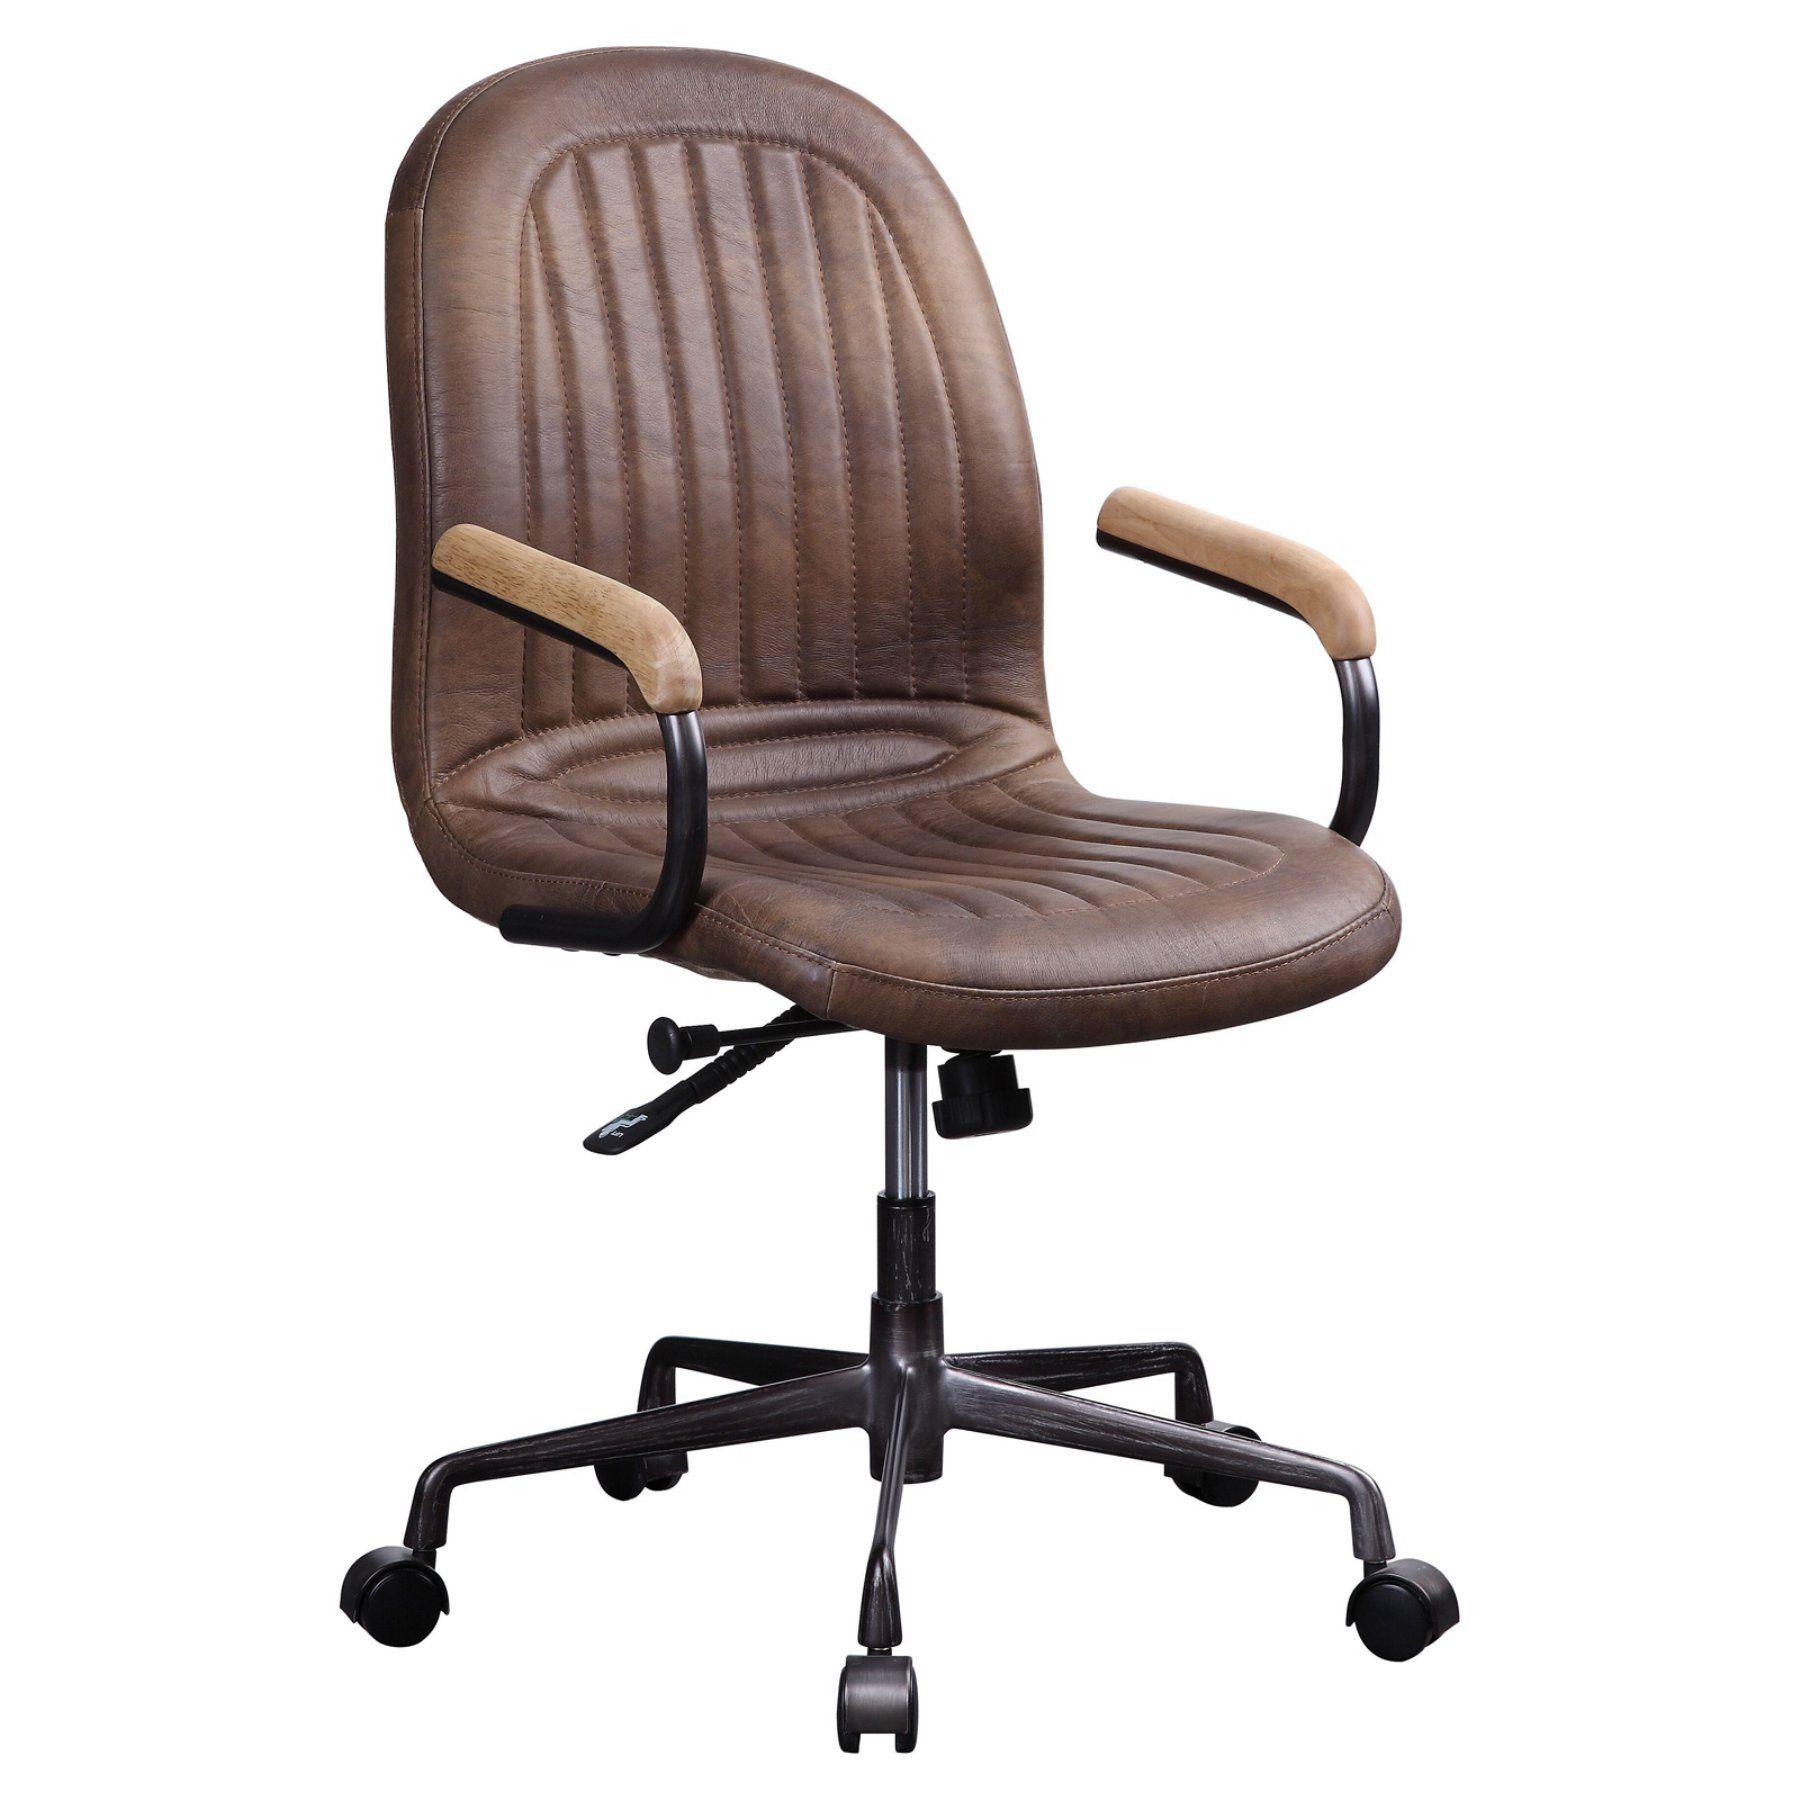 Acme Furniture Acis Leather Executive Office Chair Executive